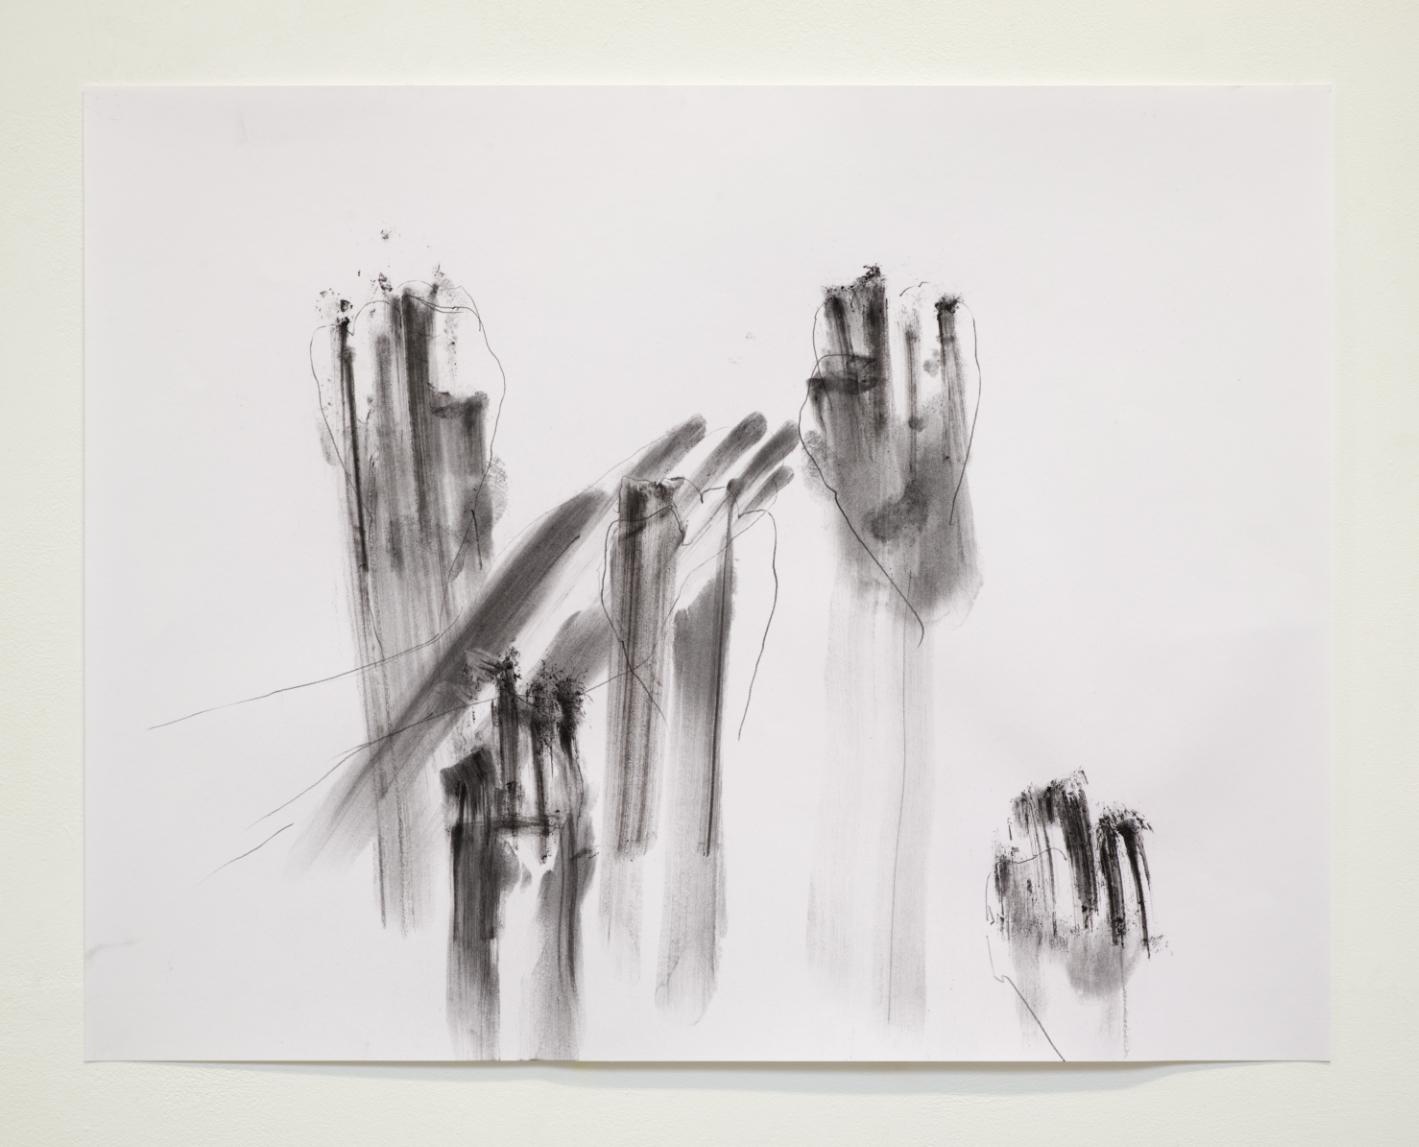 2020- Precariat- 50x65cm- Charcoal and pencil on paper